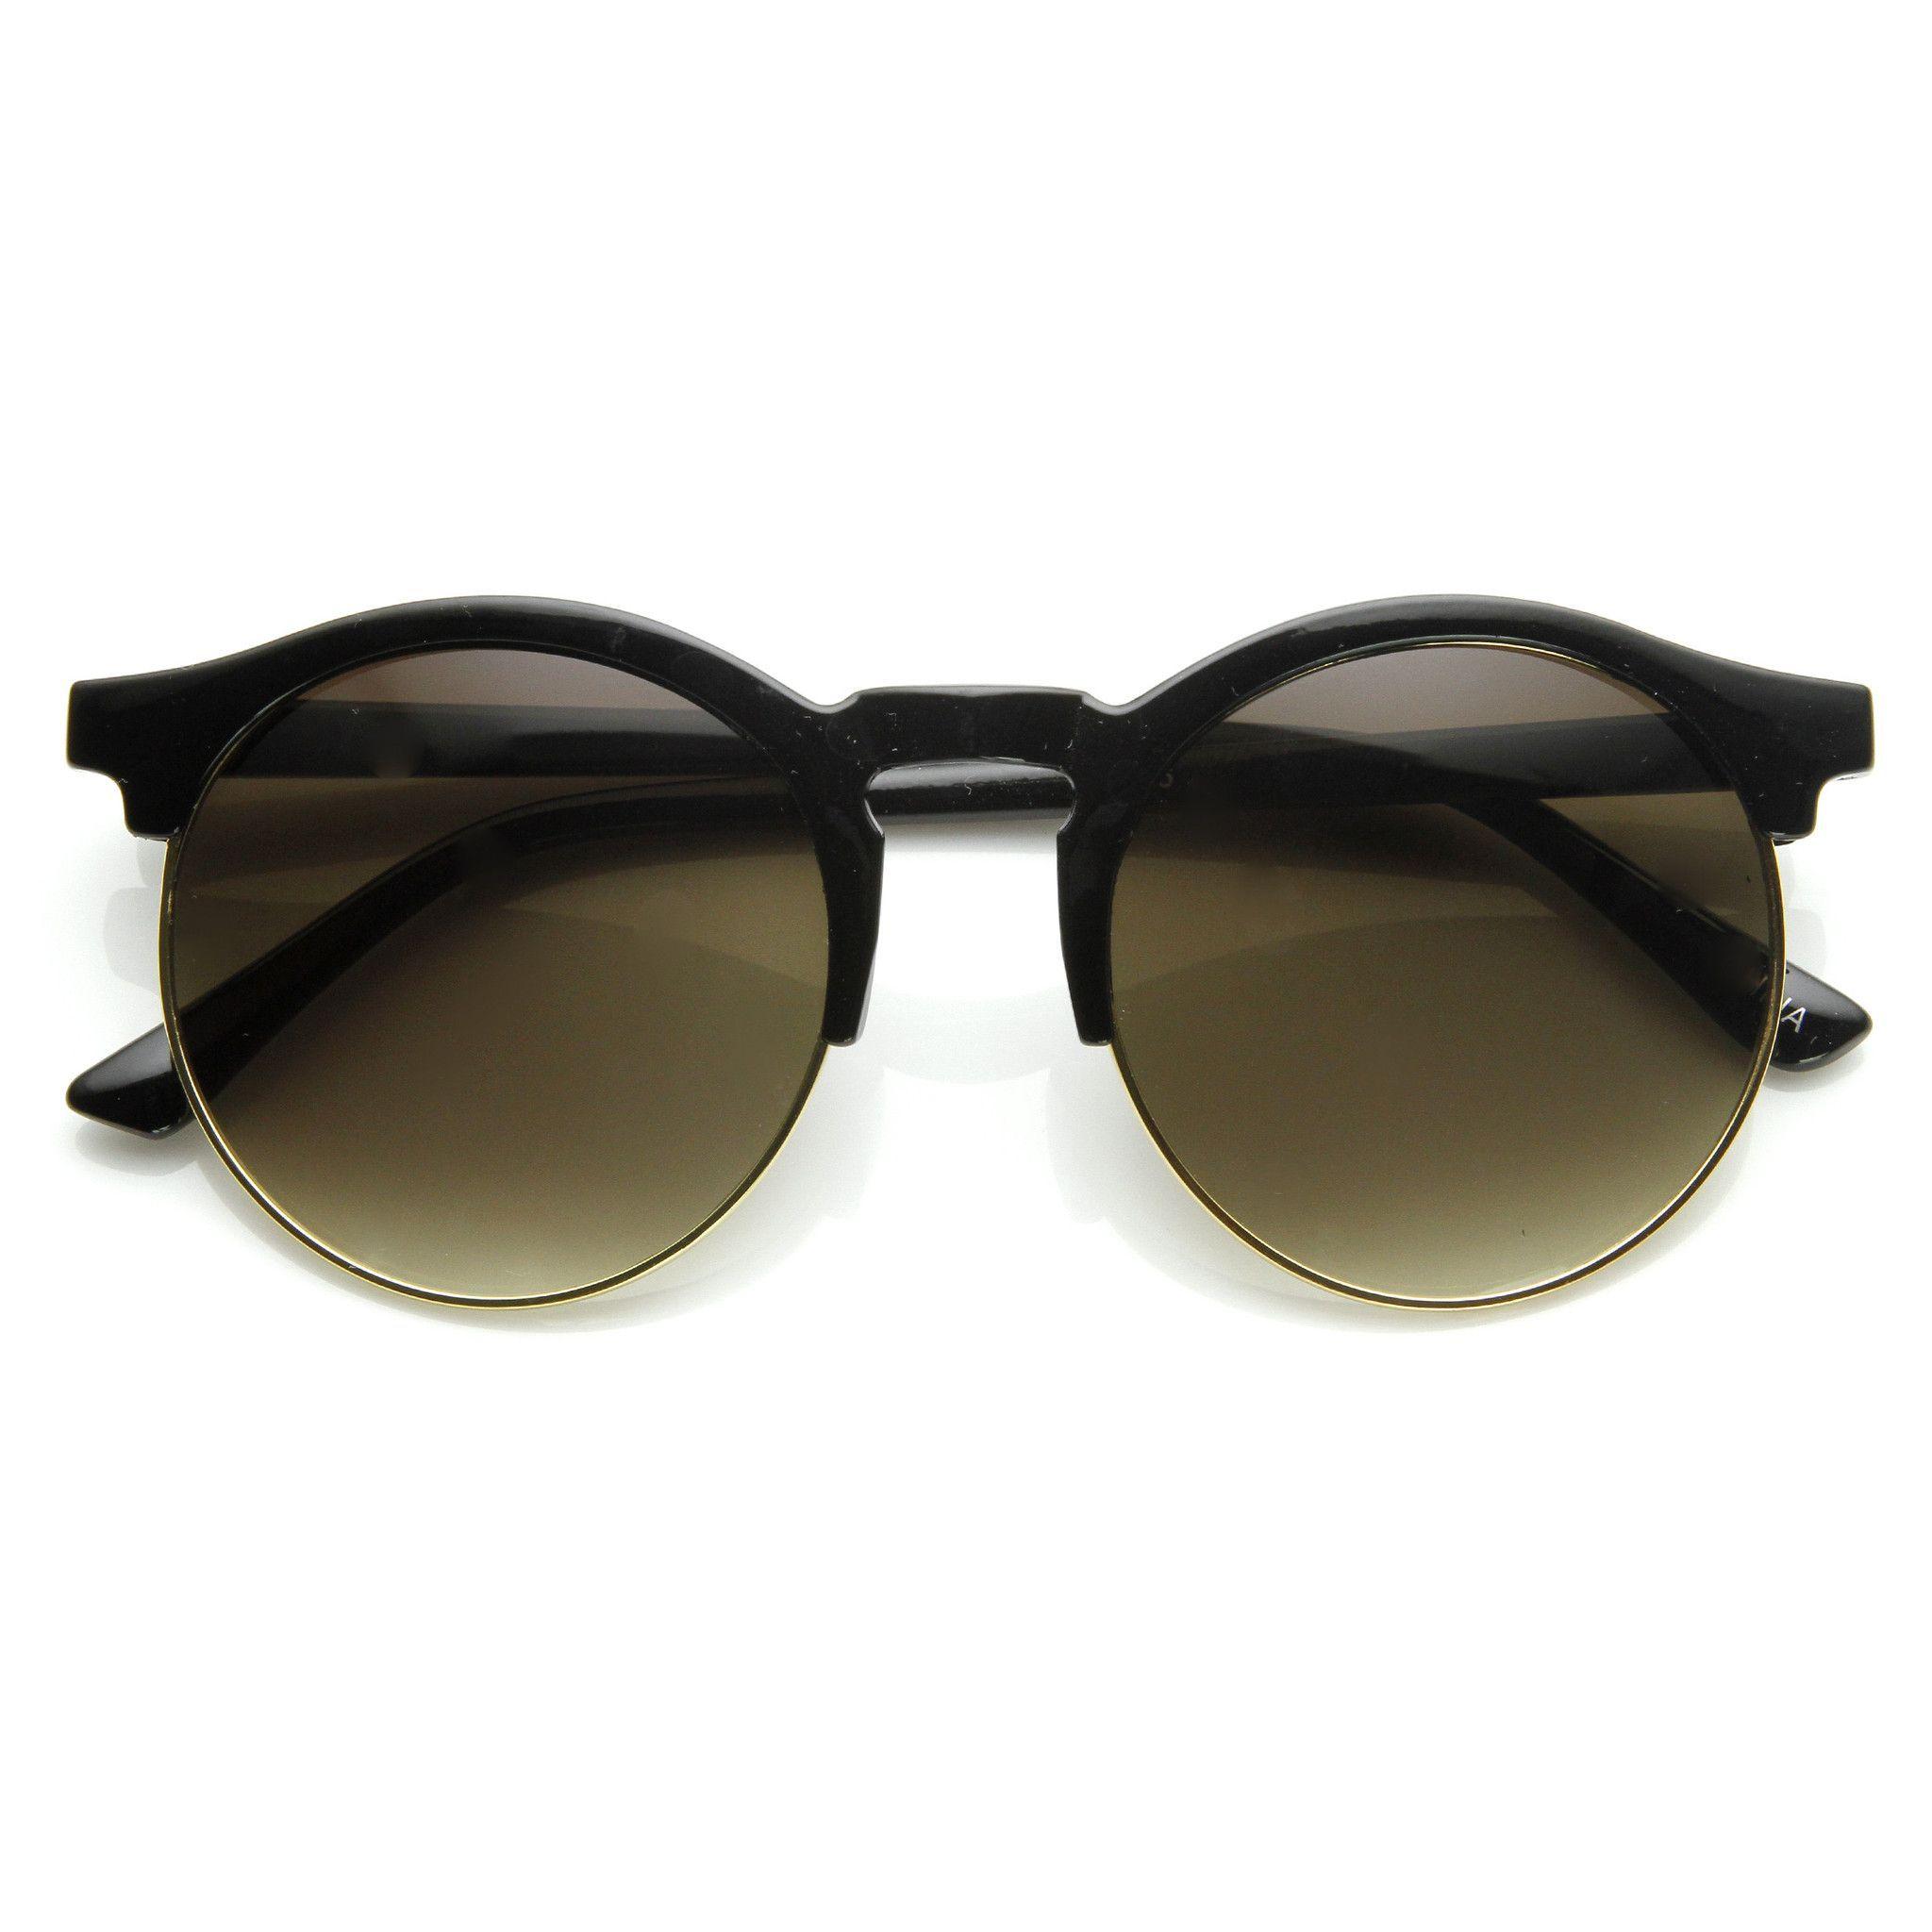 339b5fa7342 Oversize Vintage Designer Inspired Round Indie Half Frame Sunglasses 9173 from  zeroUV